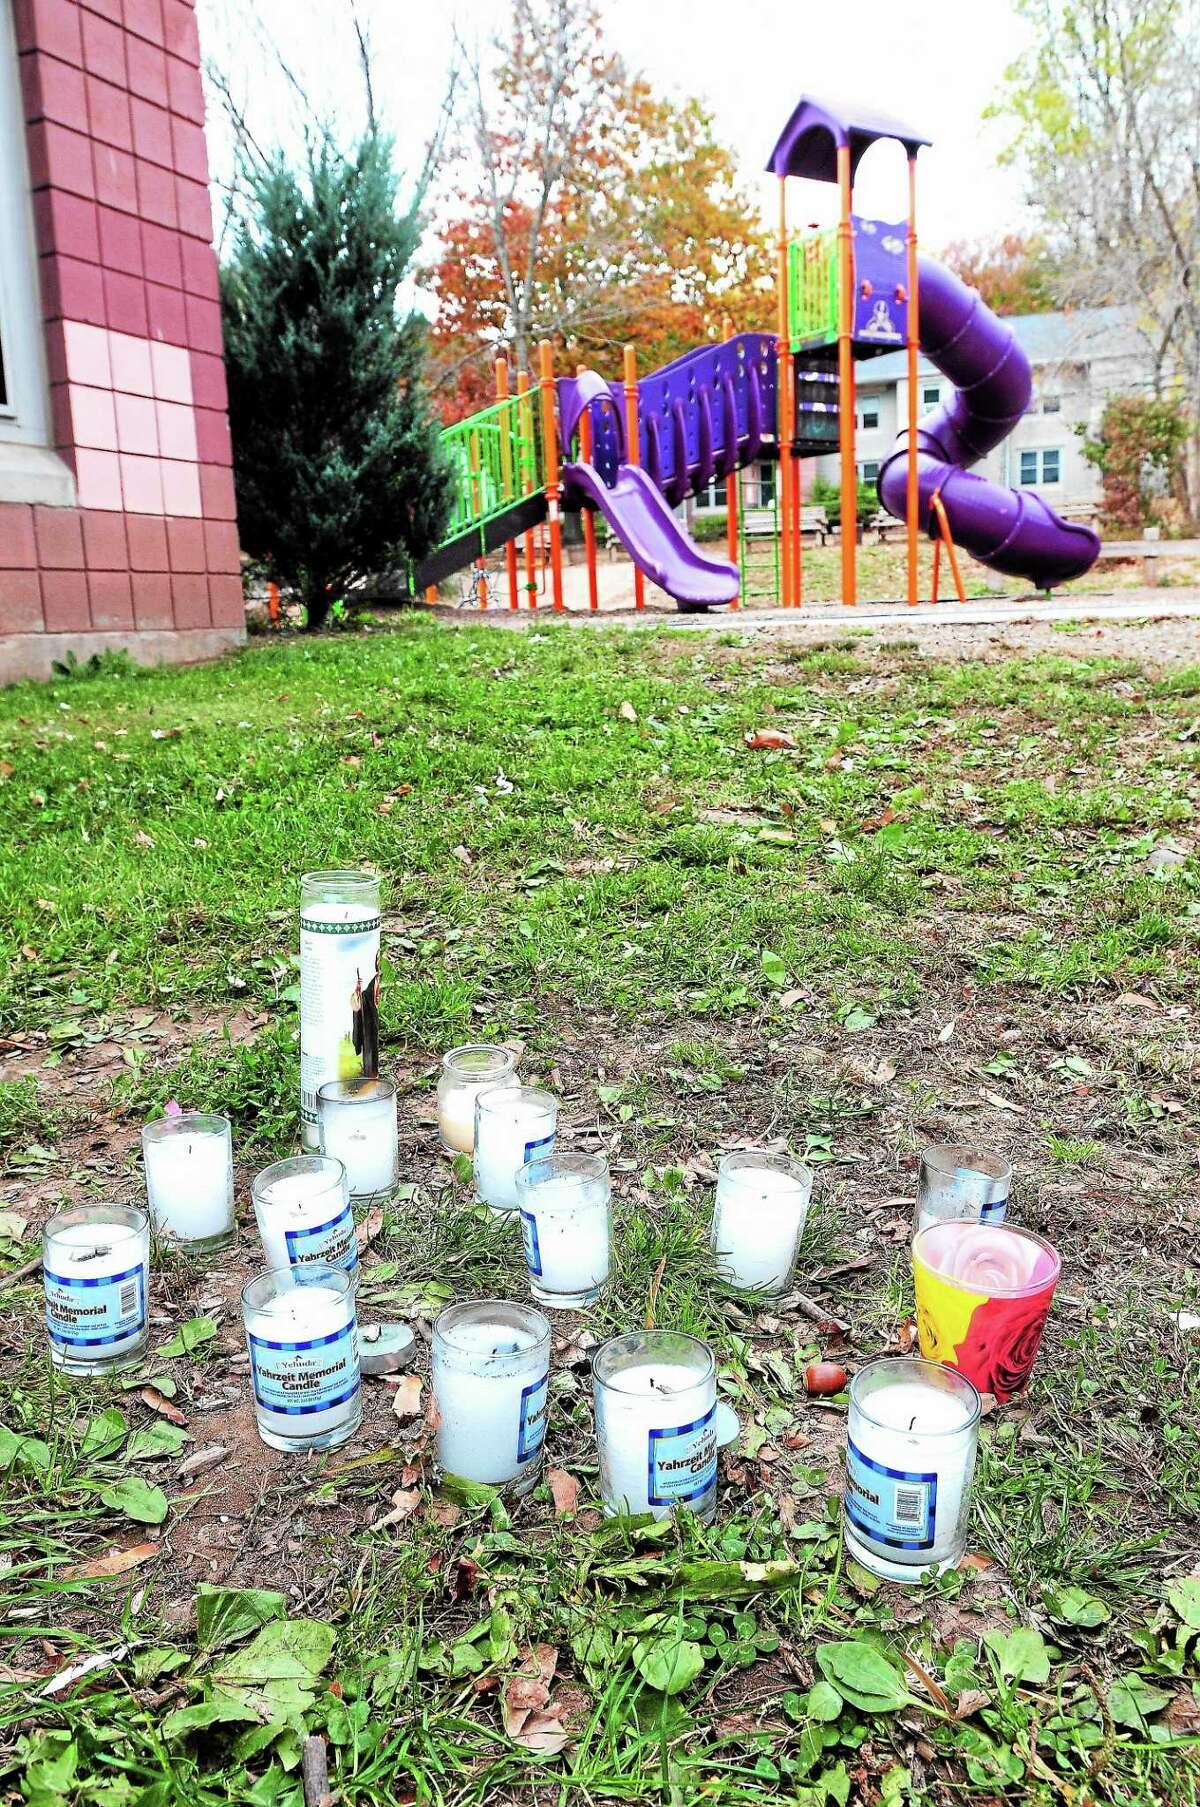 A memorial for homicide victim Deran Maebury is seen at 45 Wayfarer St. in New Haven this week.